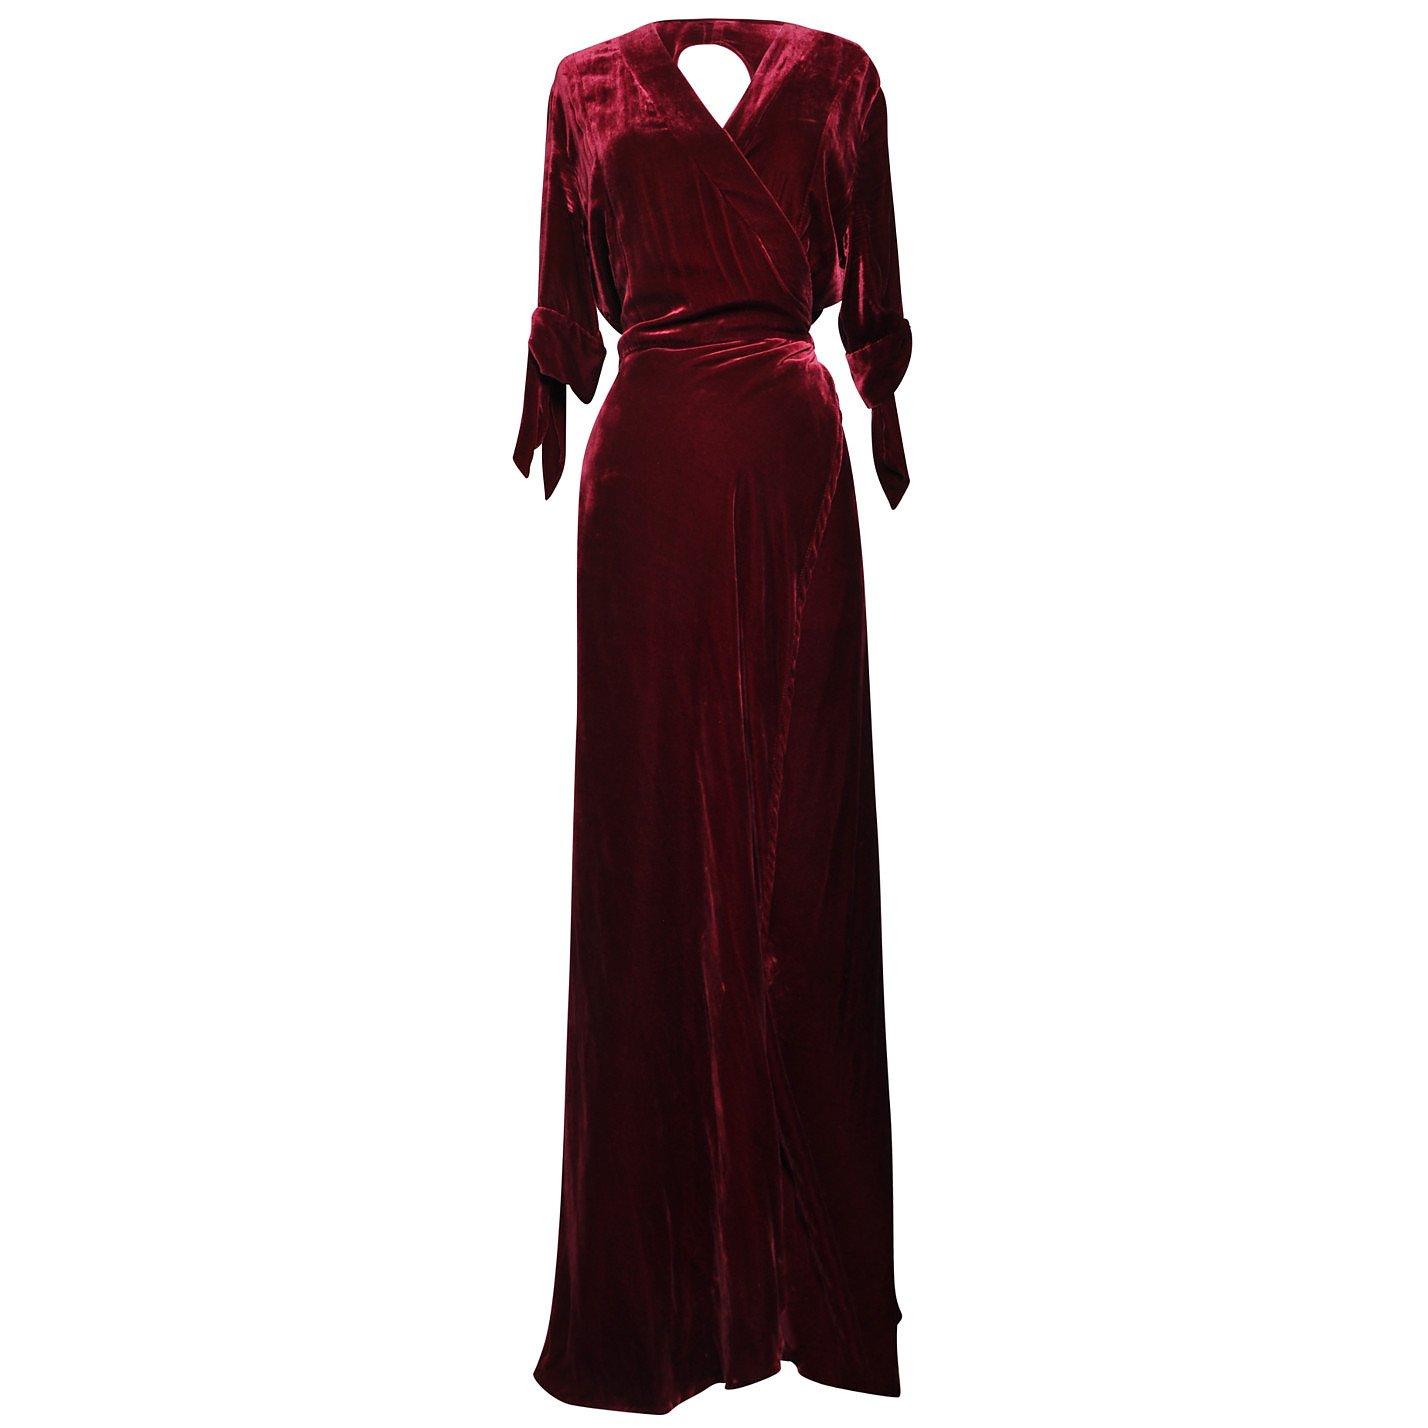 Quuina Velvet Wrap Dress